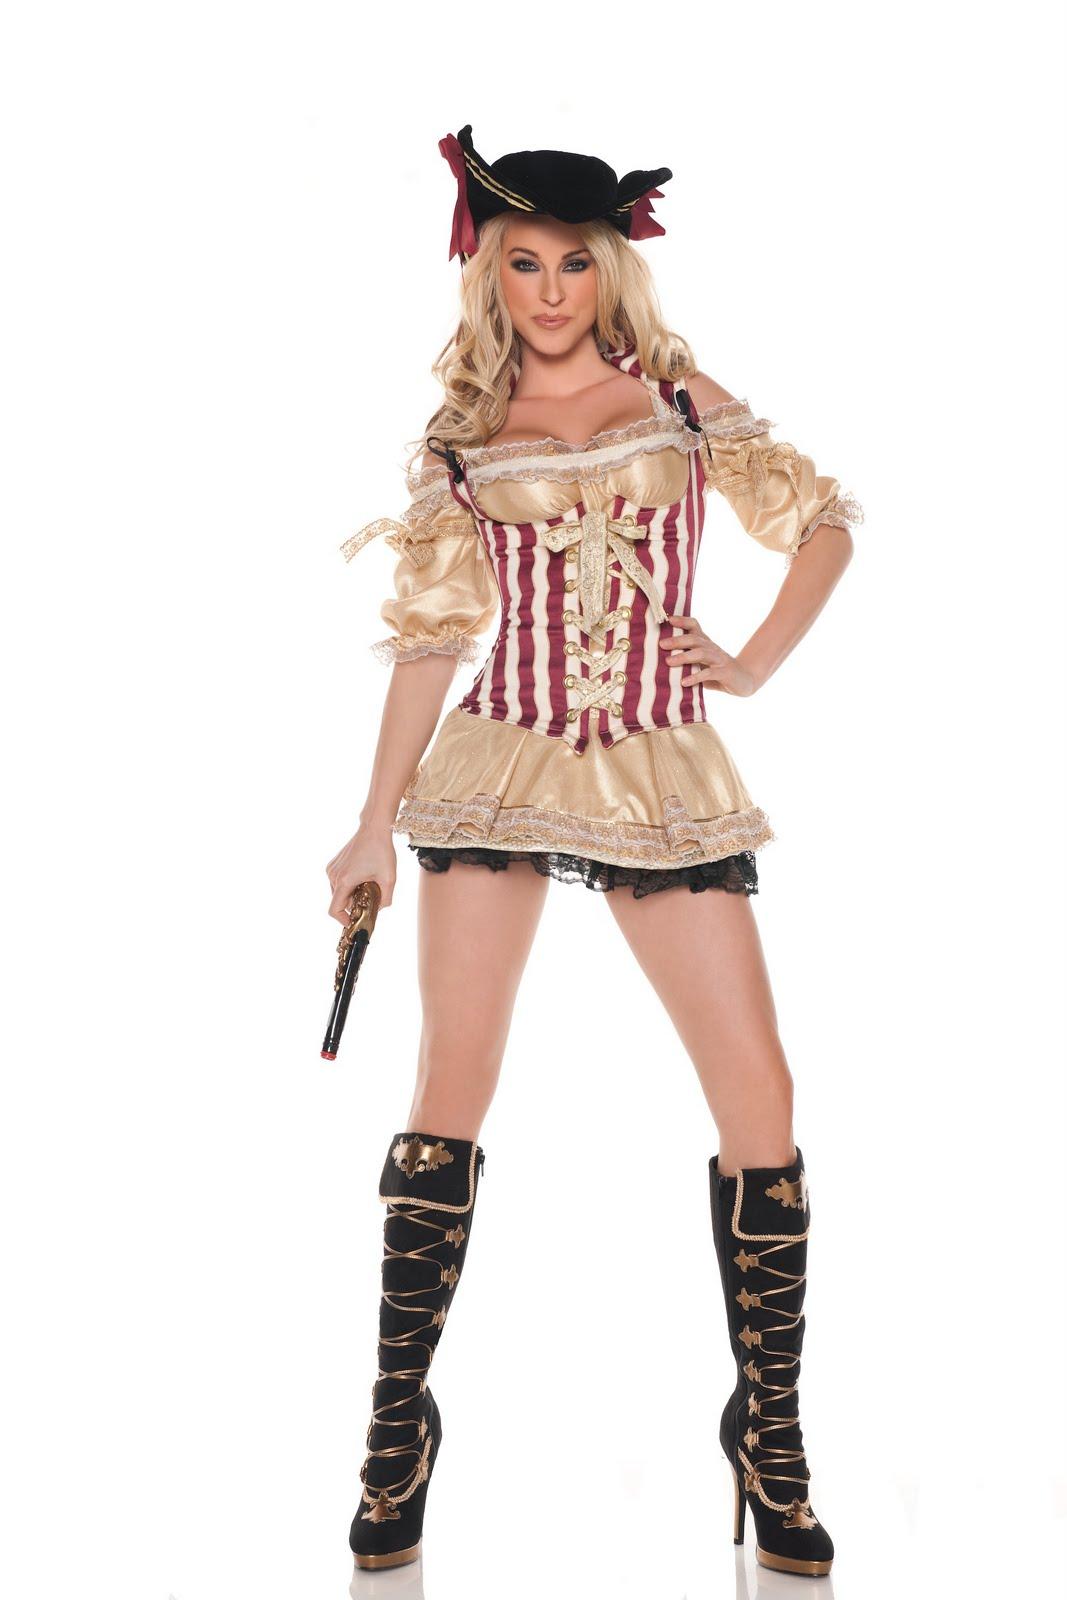 Sexy Pirate Costume pre teen model, euro teen girl